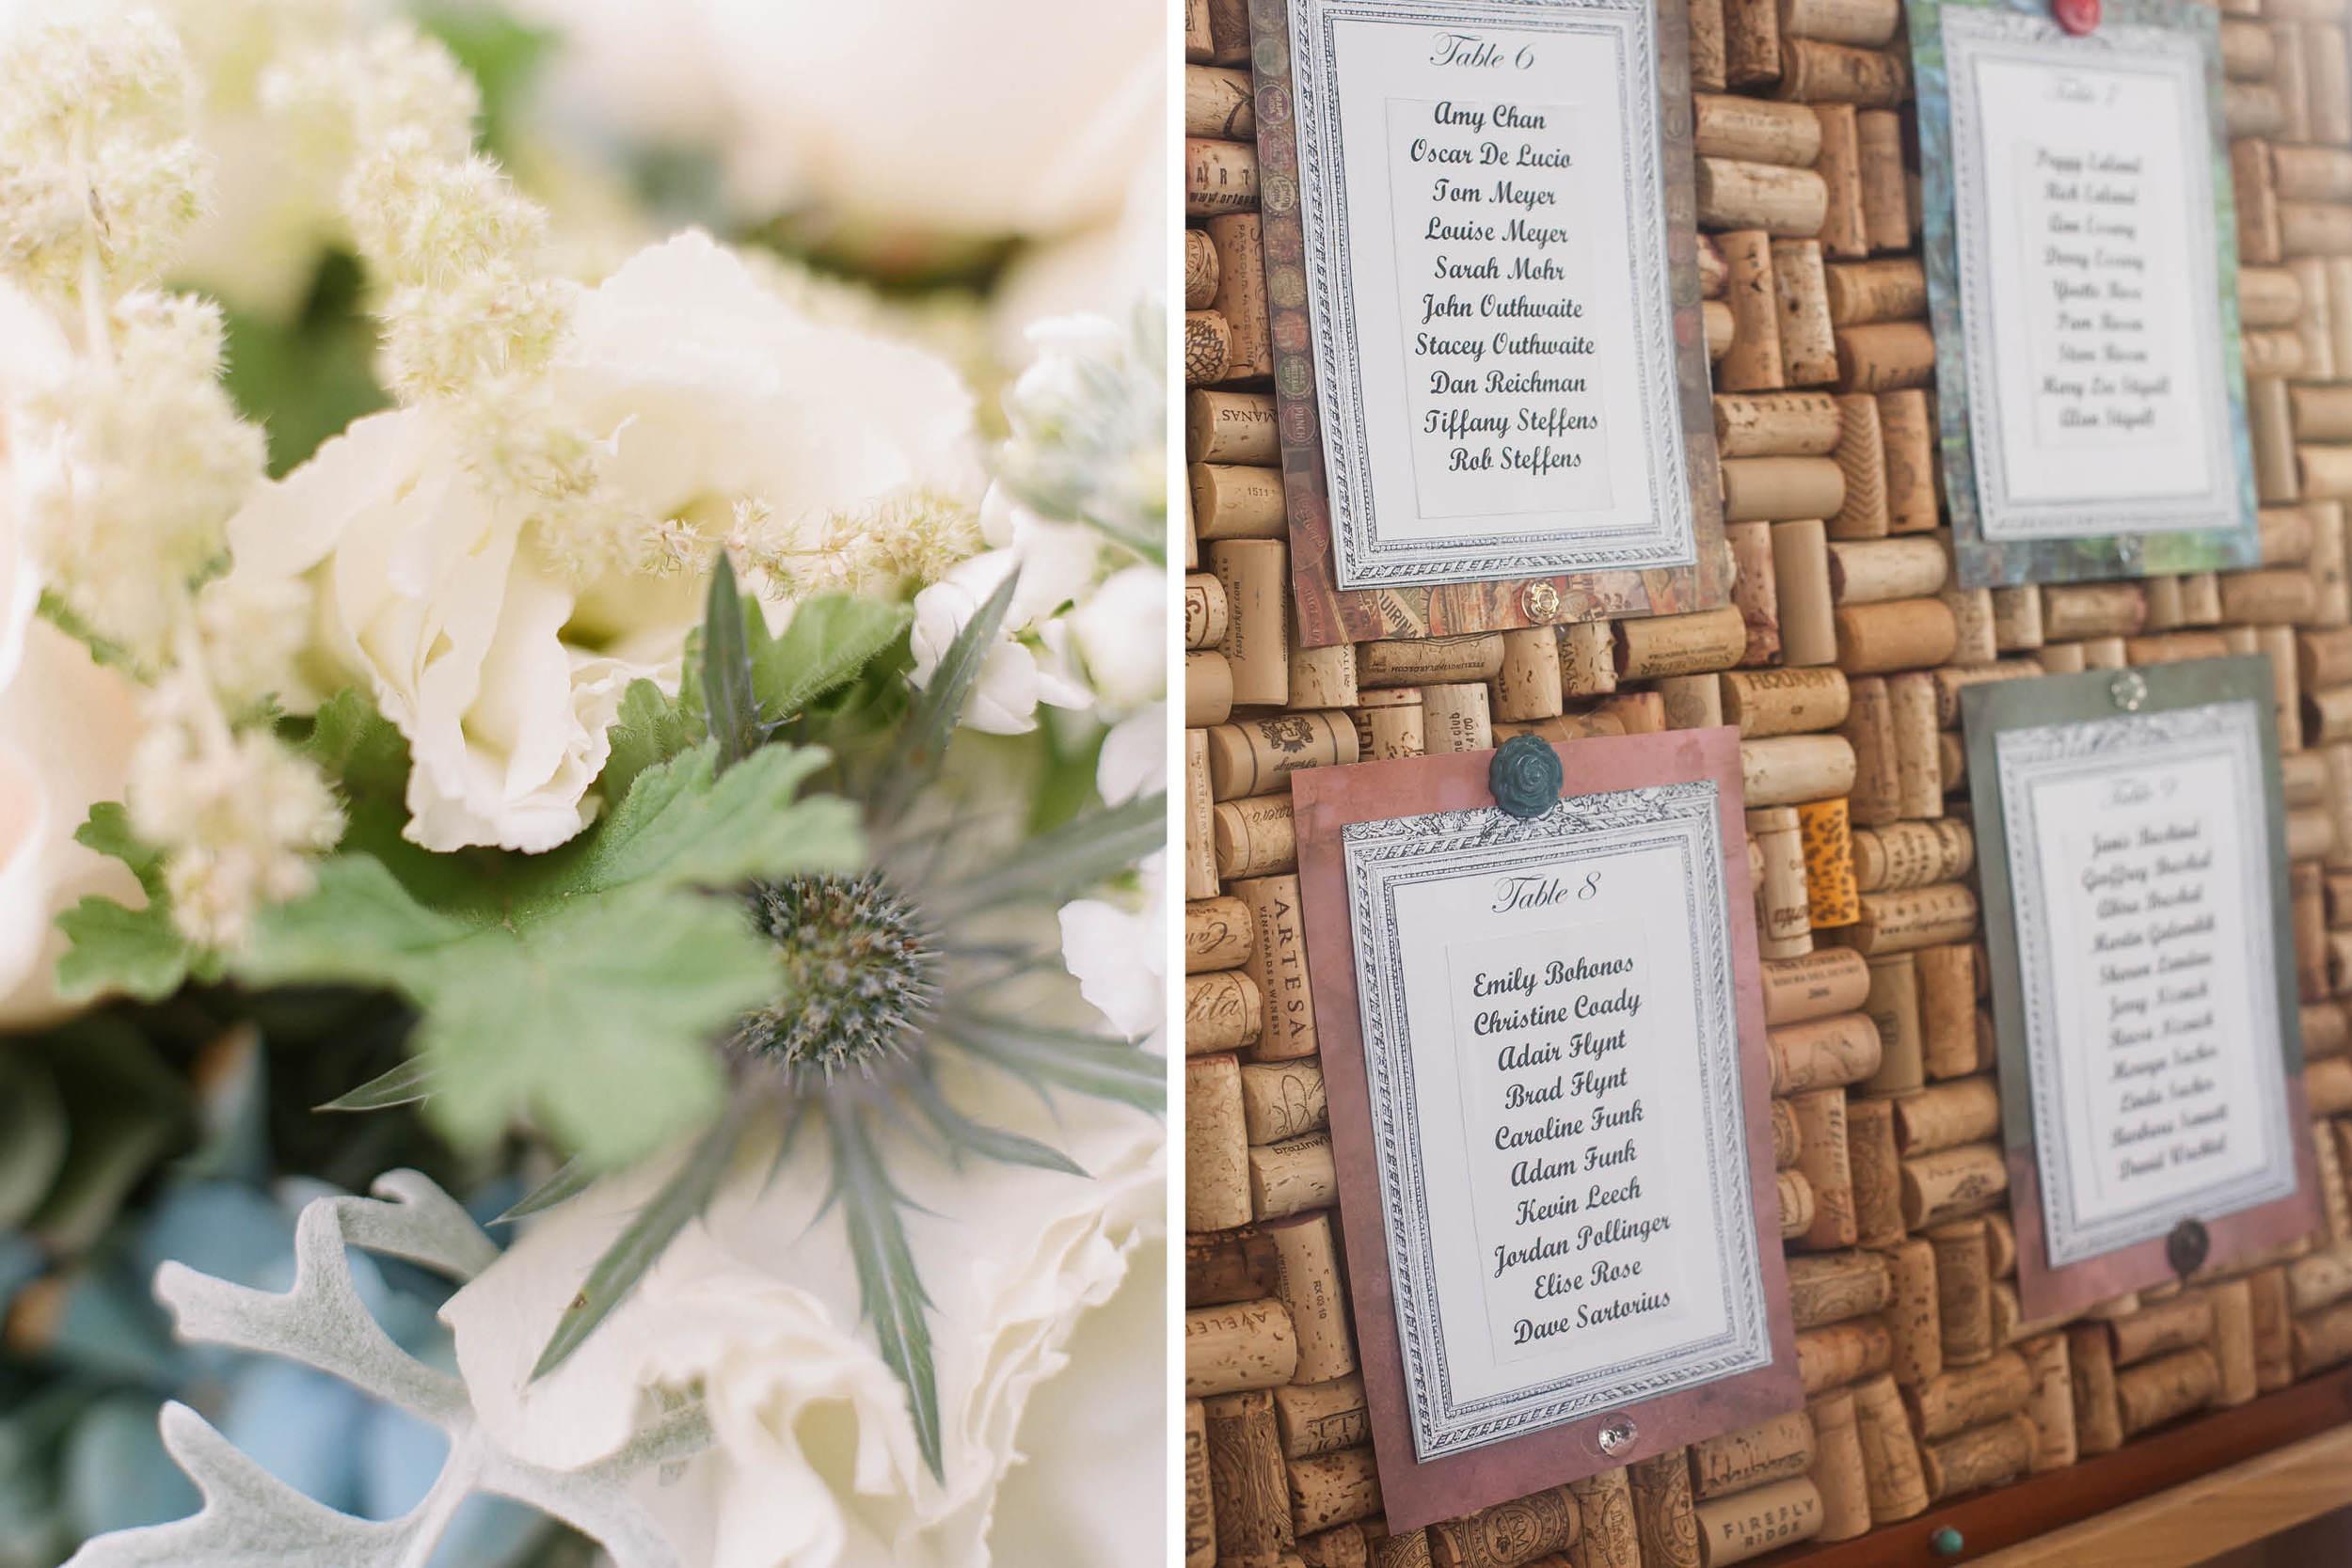 tres-hermanas-winery-vineyard-wedding-planner-coordinator-santa-barbara-ynez-maria (12).jpg